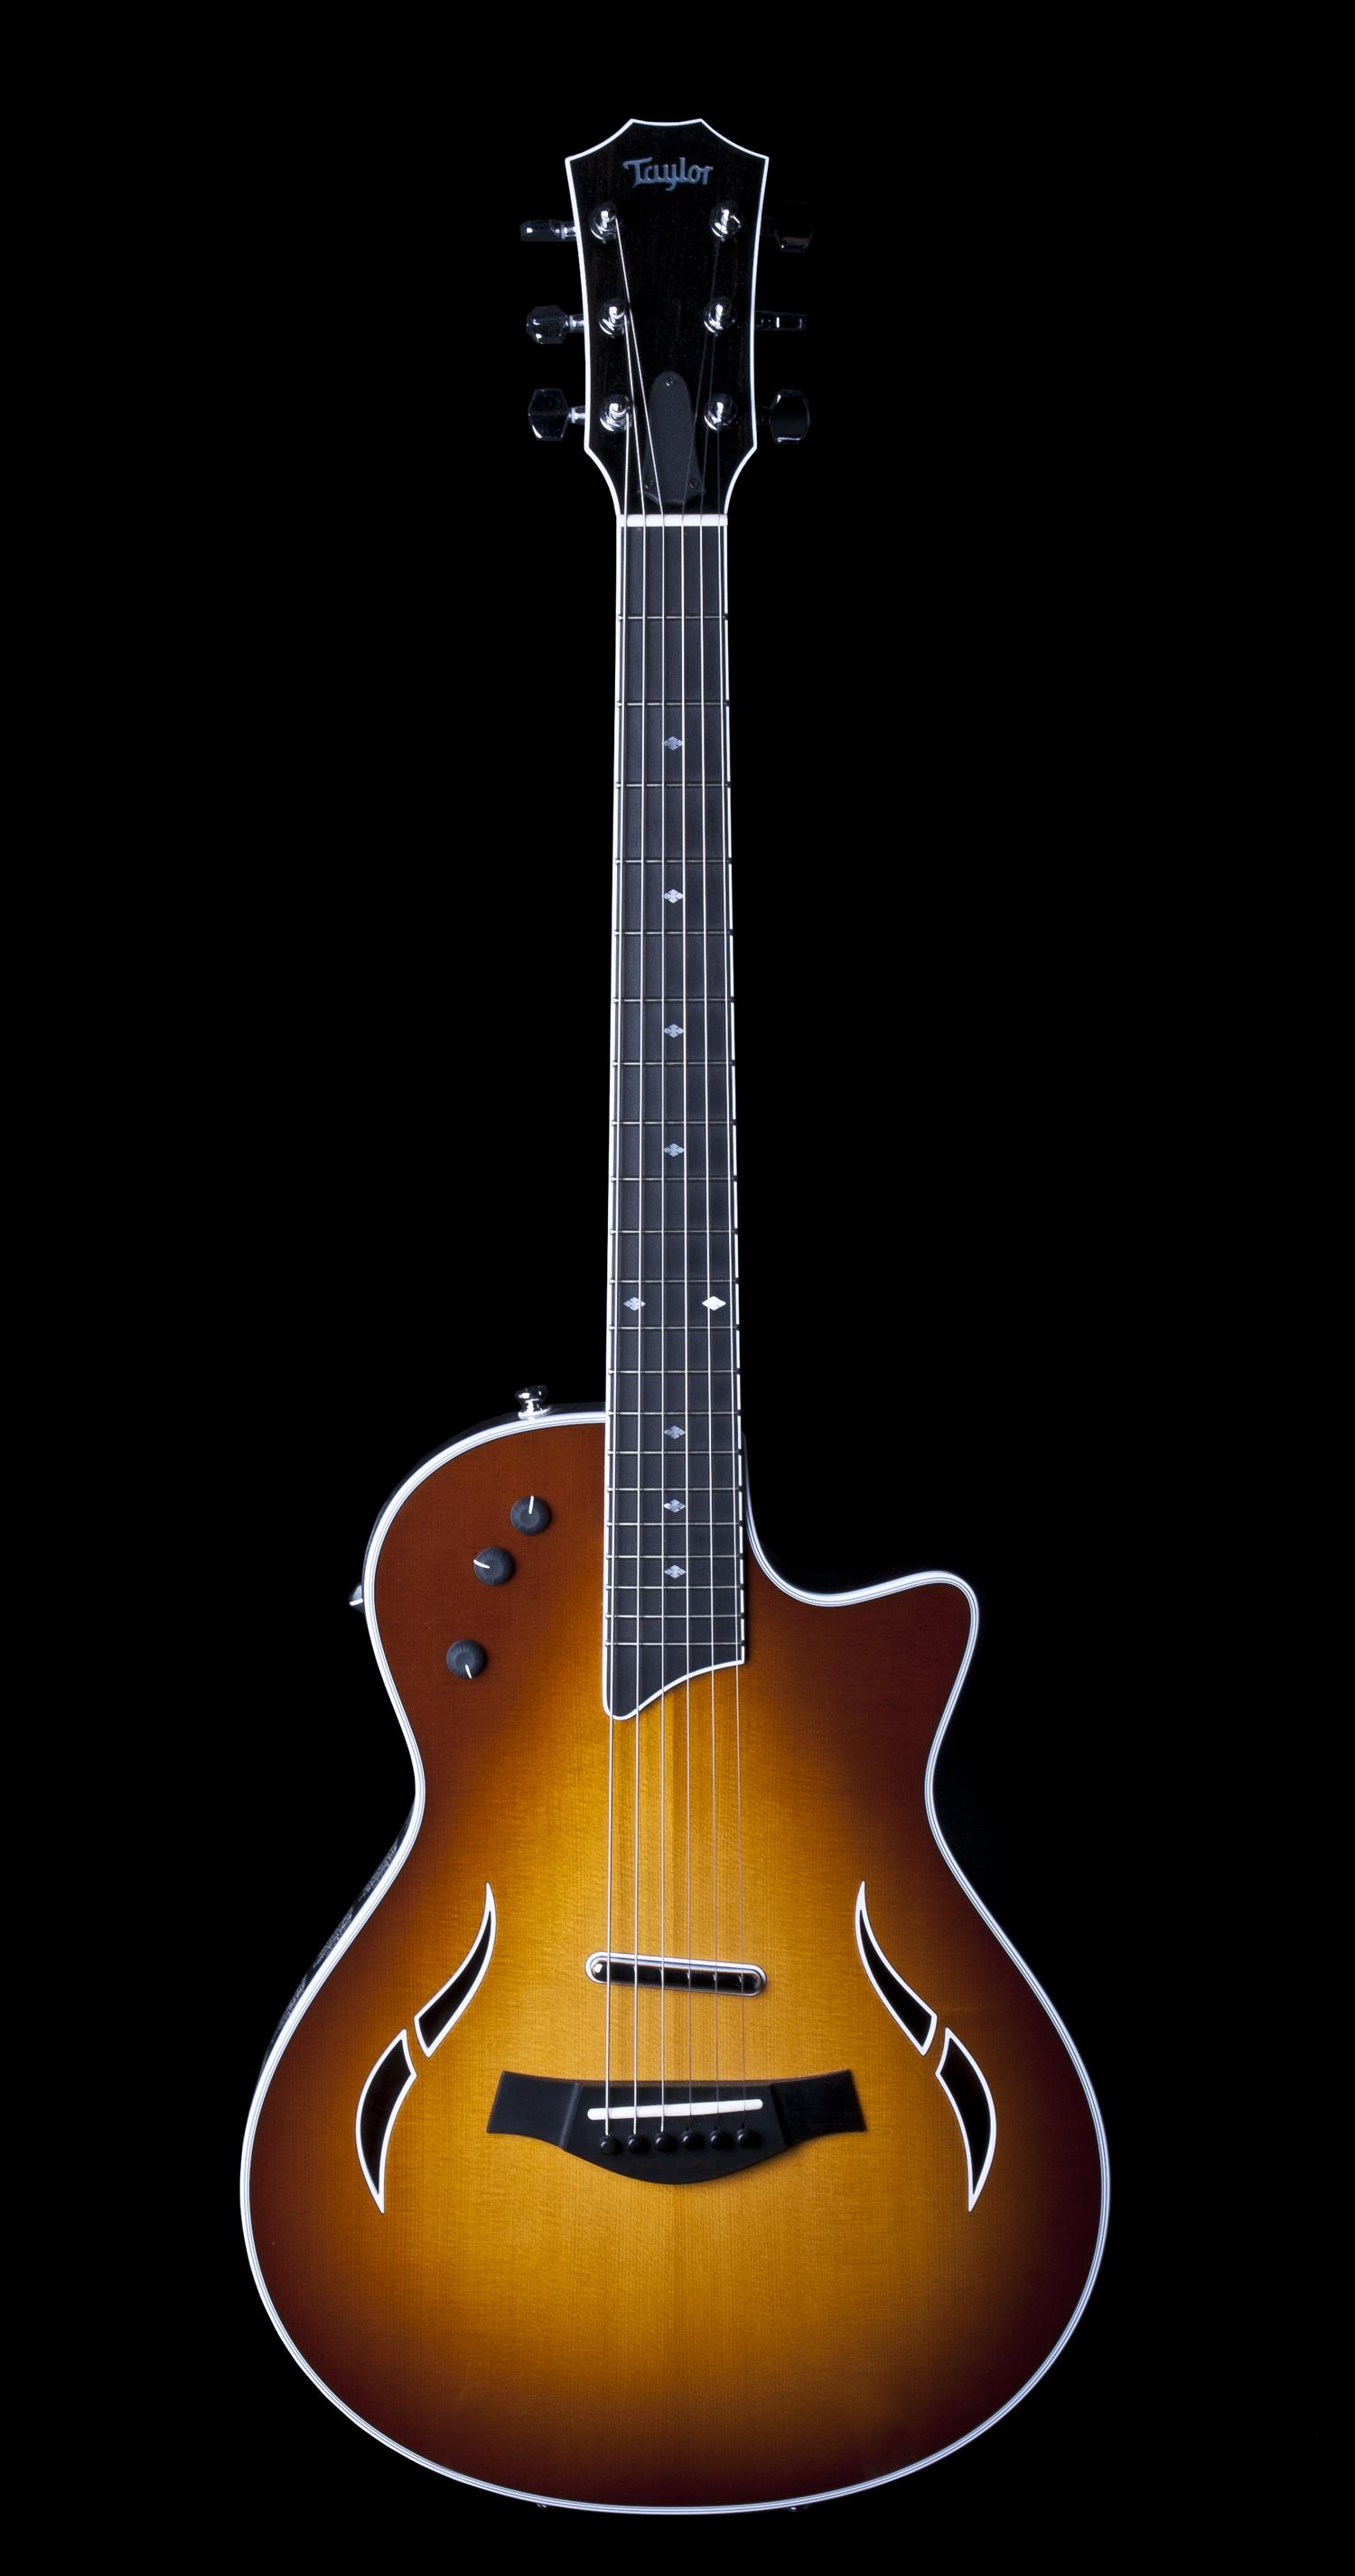 taylor t5 standard thinline acoustic electric guitar in. Black Bedroom Furniture Sets. Home Design Ideas